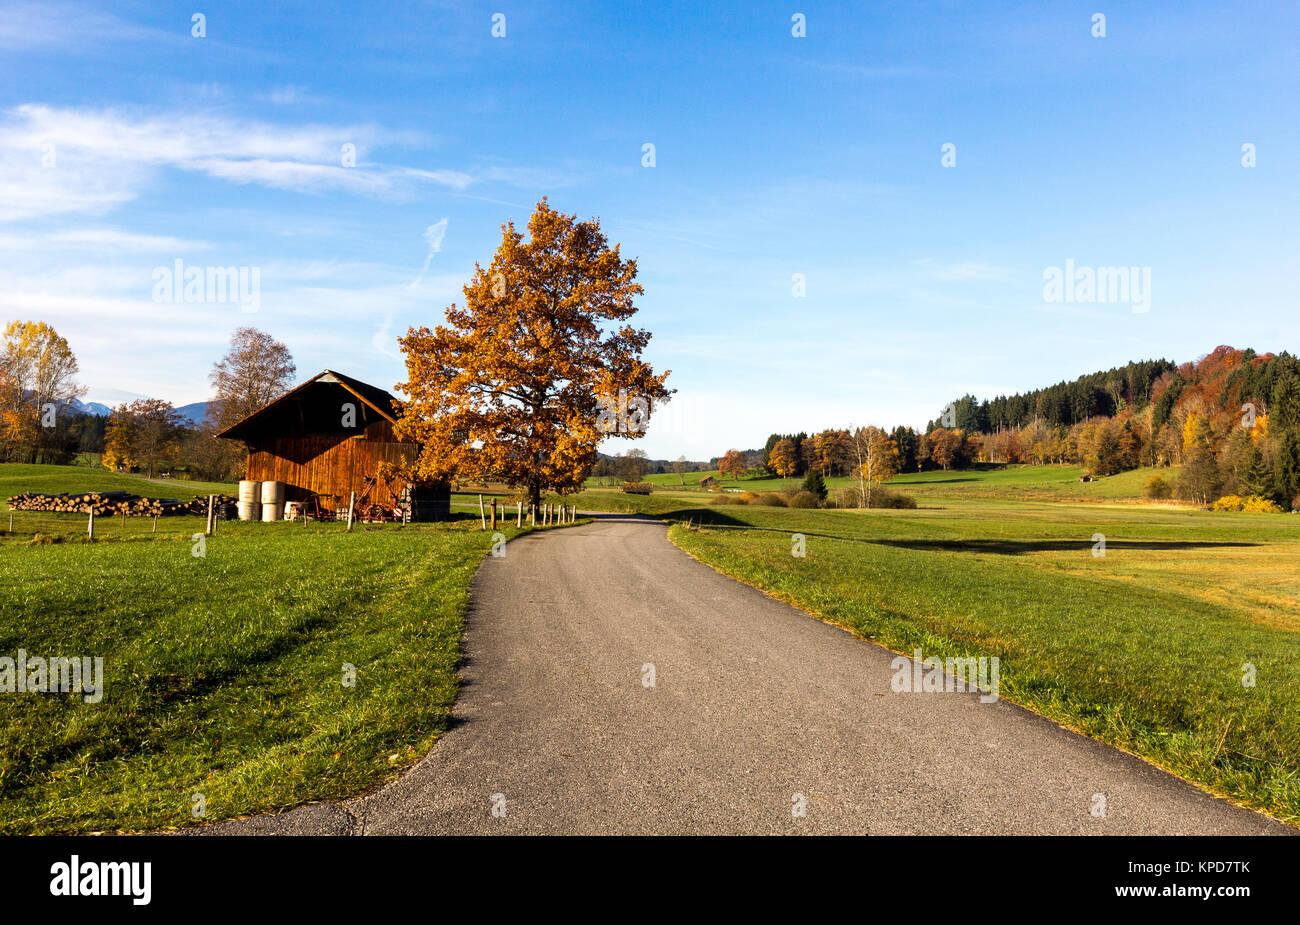 a peaceful walkway in autumnal scenery Stock Photo